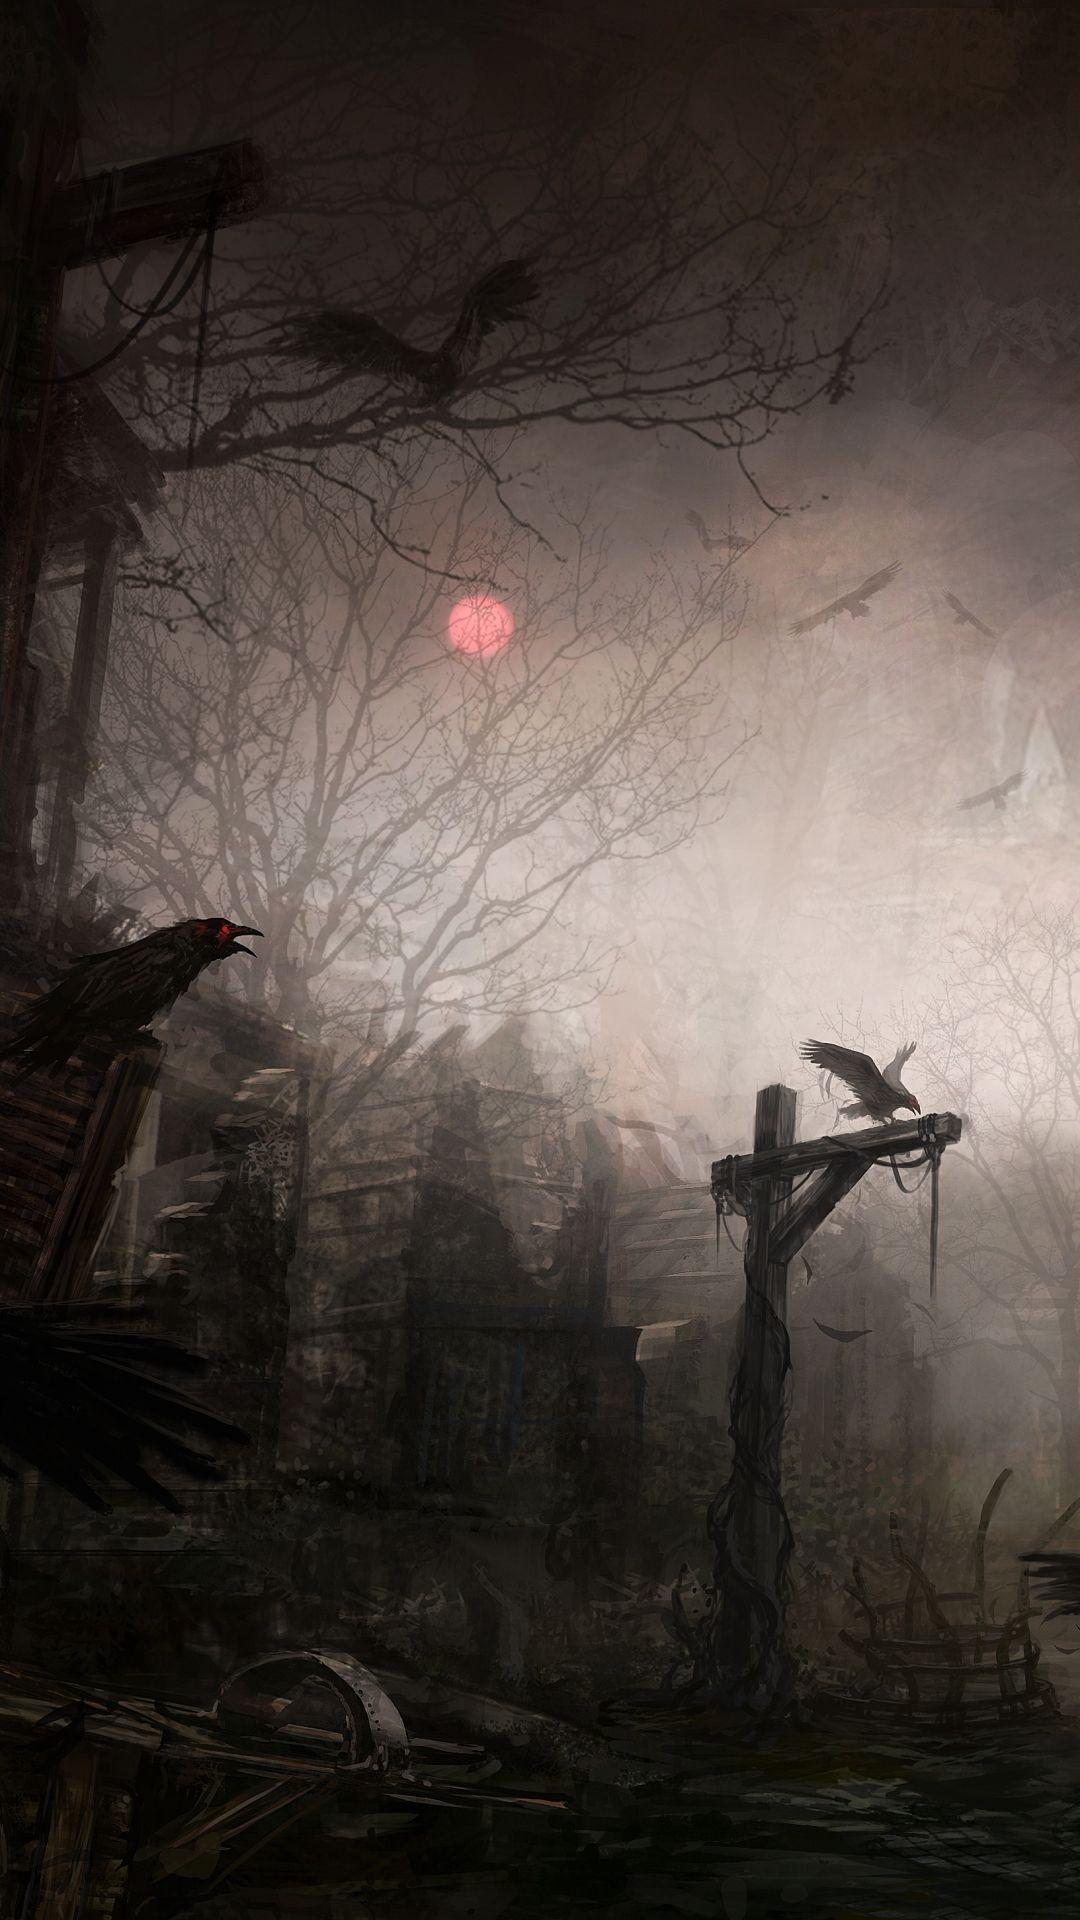 Video Game Diablo III Diablo Town Dark Gothic Raven Mobile